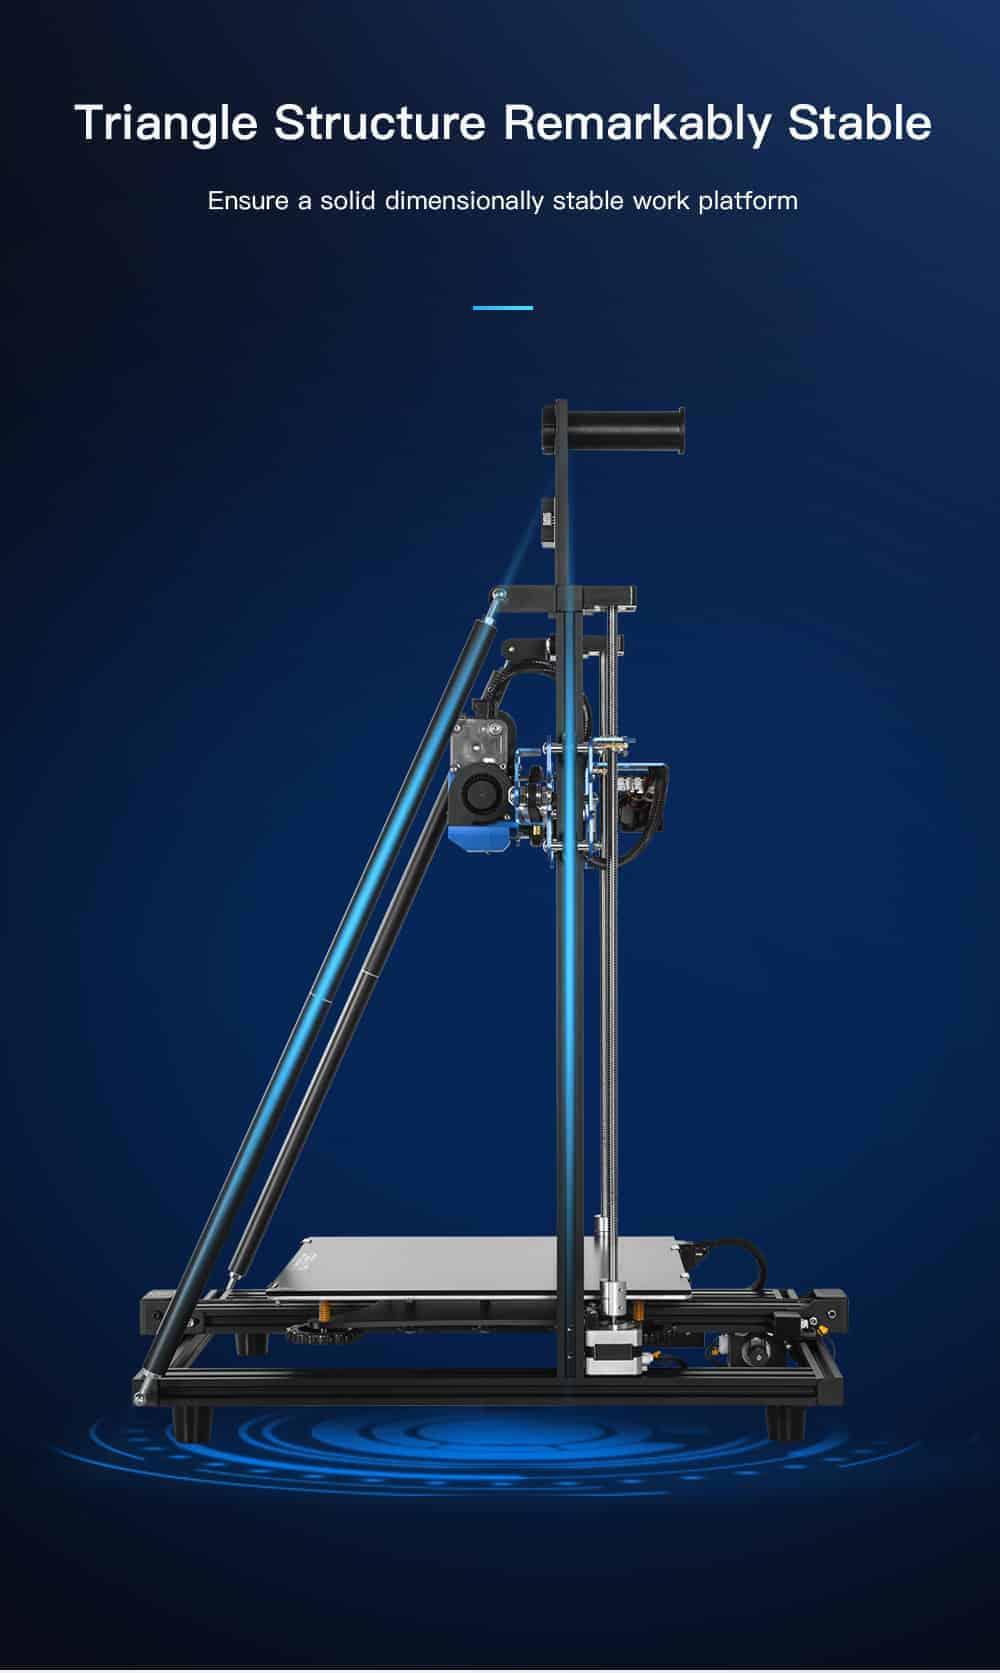 3Dprinteri - CR-10-v3_13